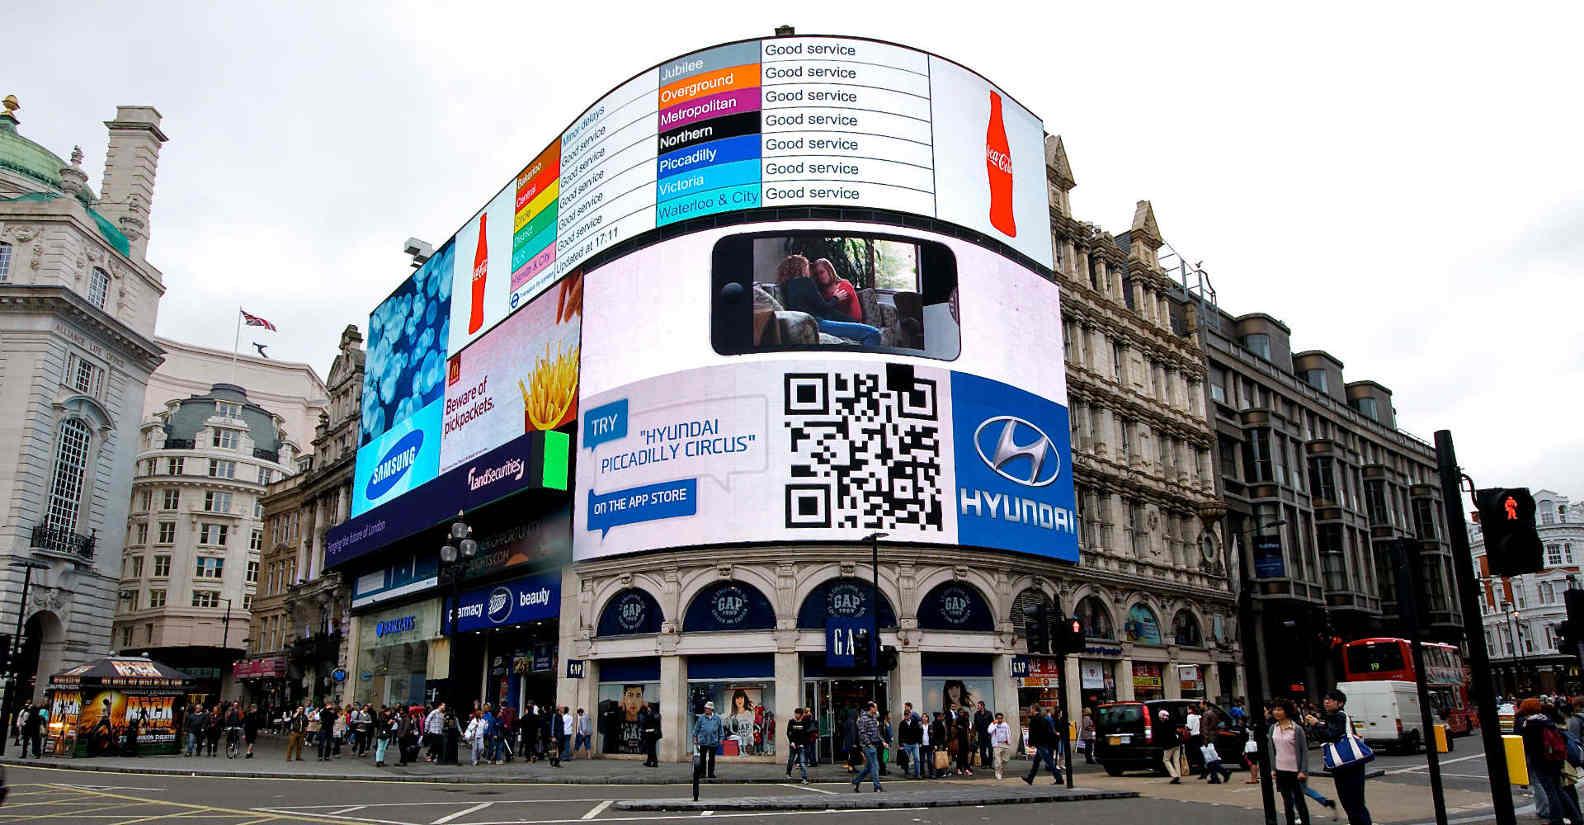 Le piazze più belle di Londra- Piccadilly Circus